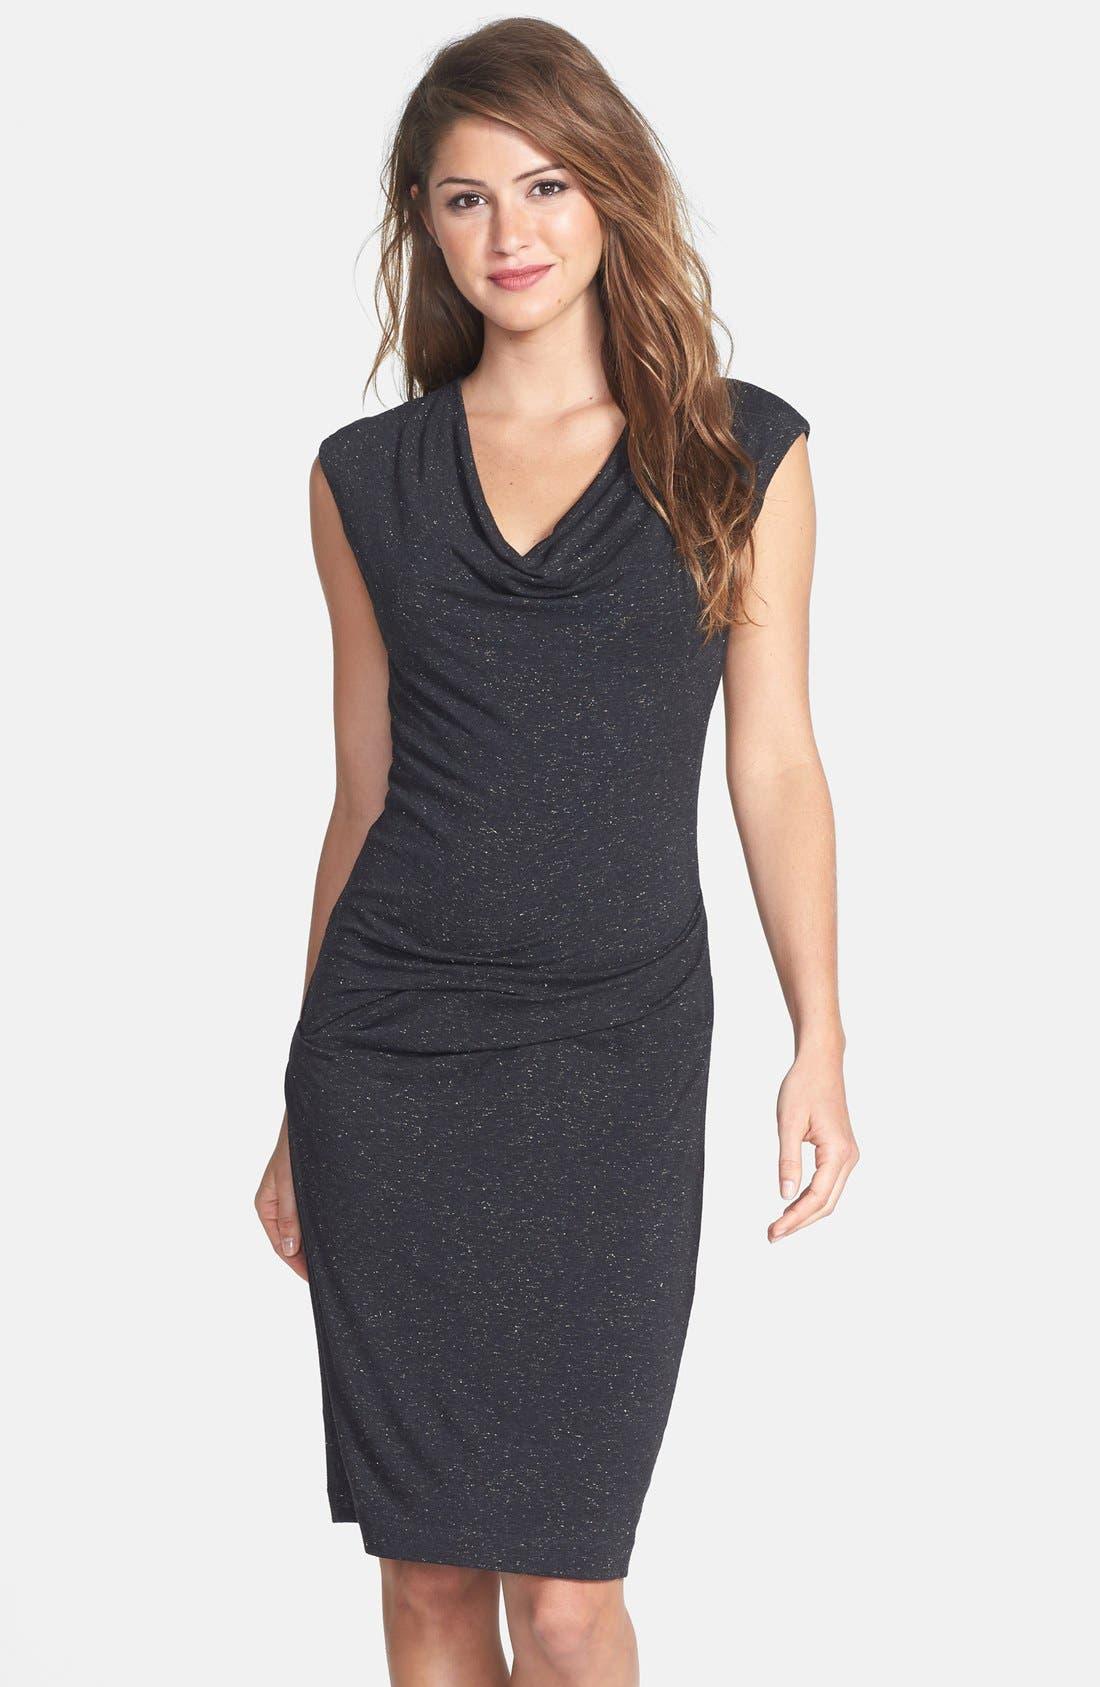 Alternate Image 1 Selected - Nicole Miller Speckled Metallic Jersey Dress